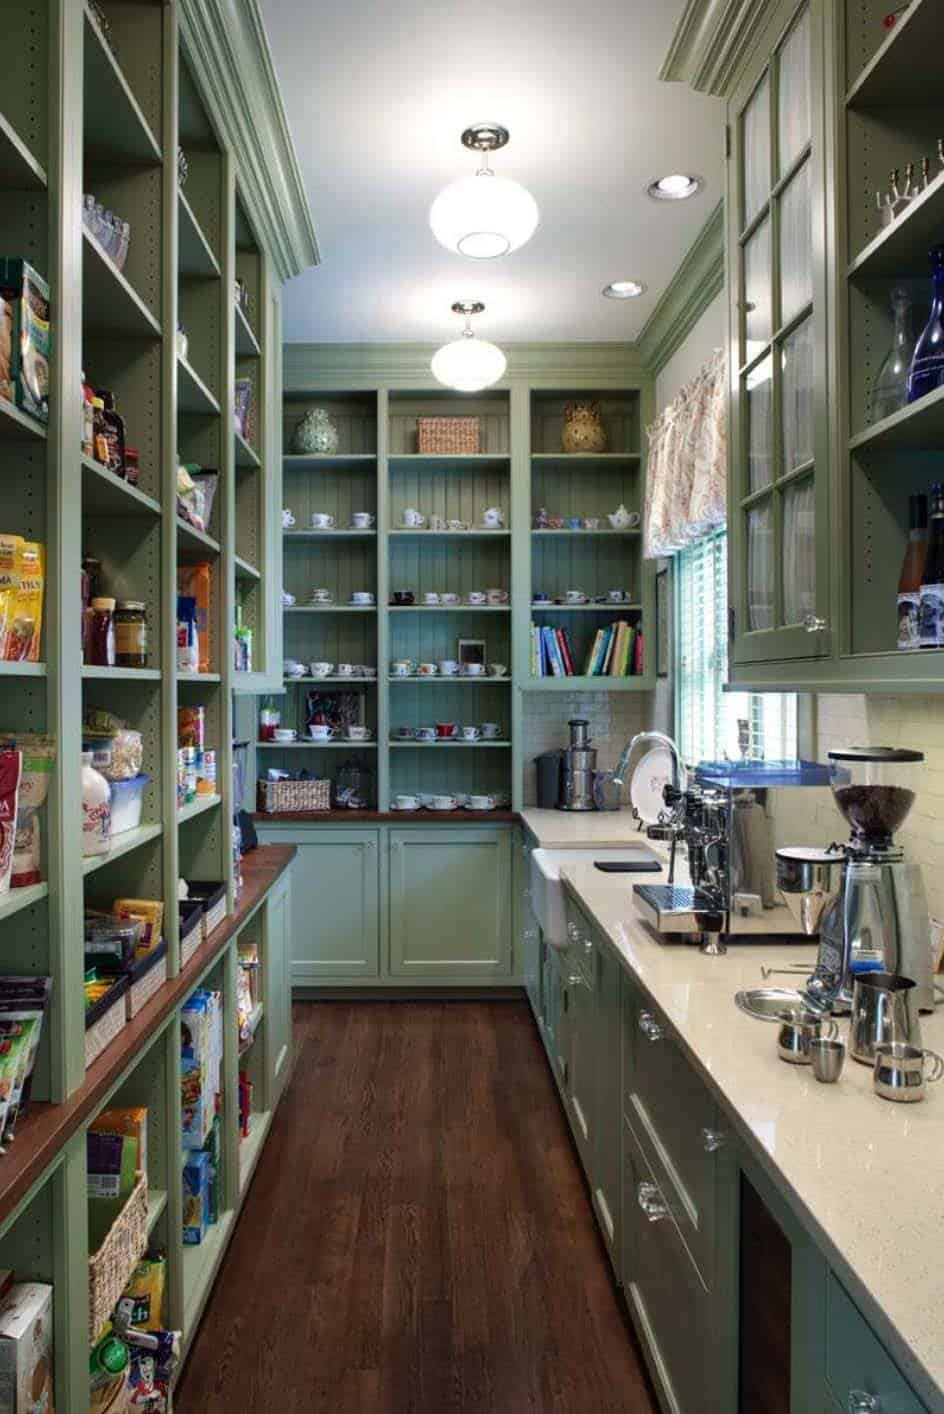 Kitchen Pantry Ideas-10-1 Kindesign